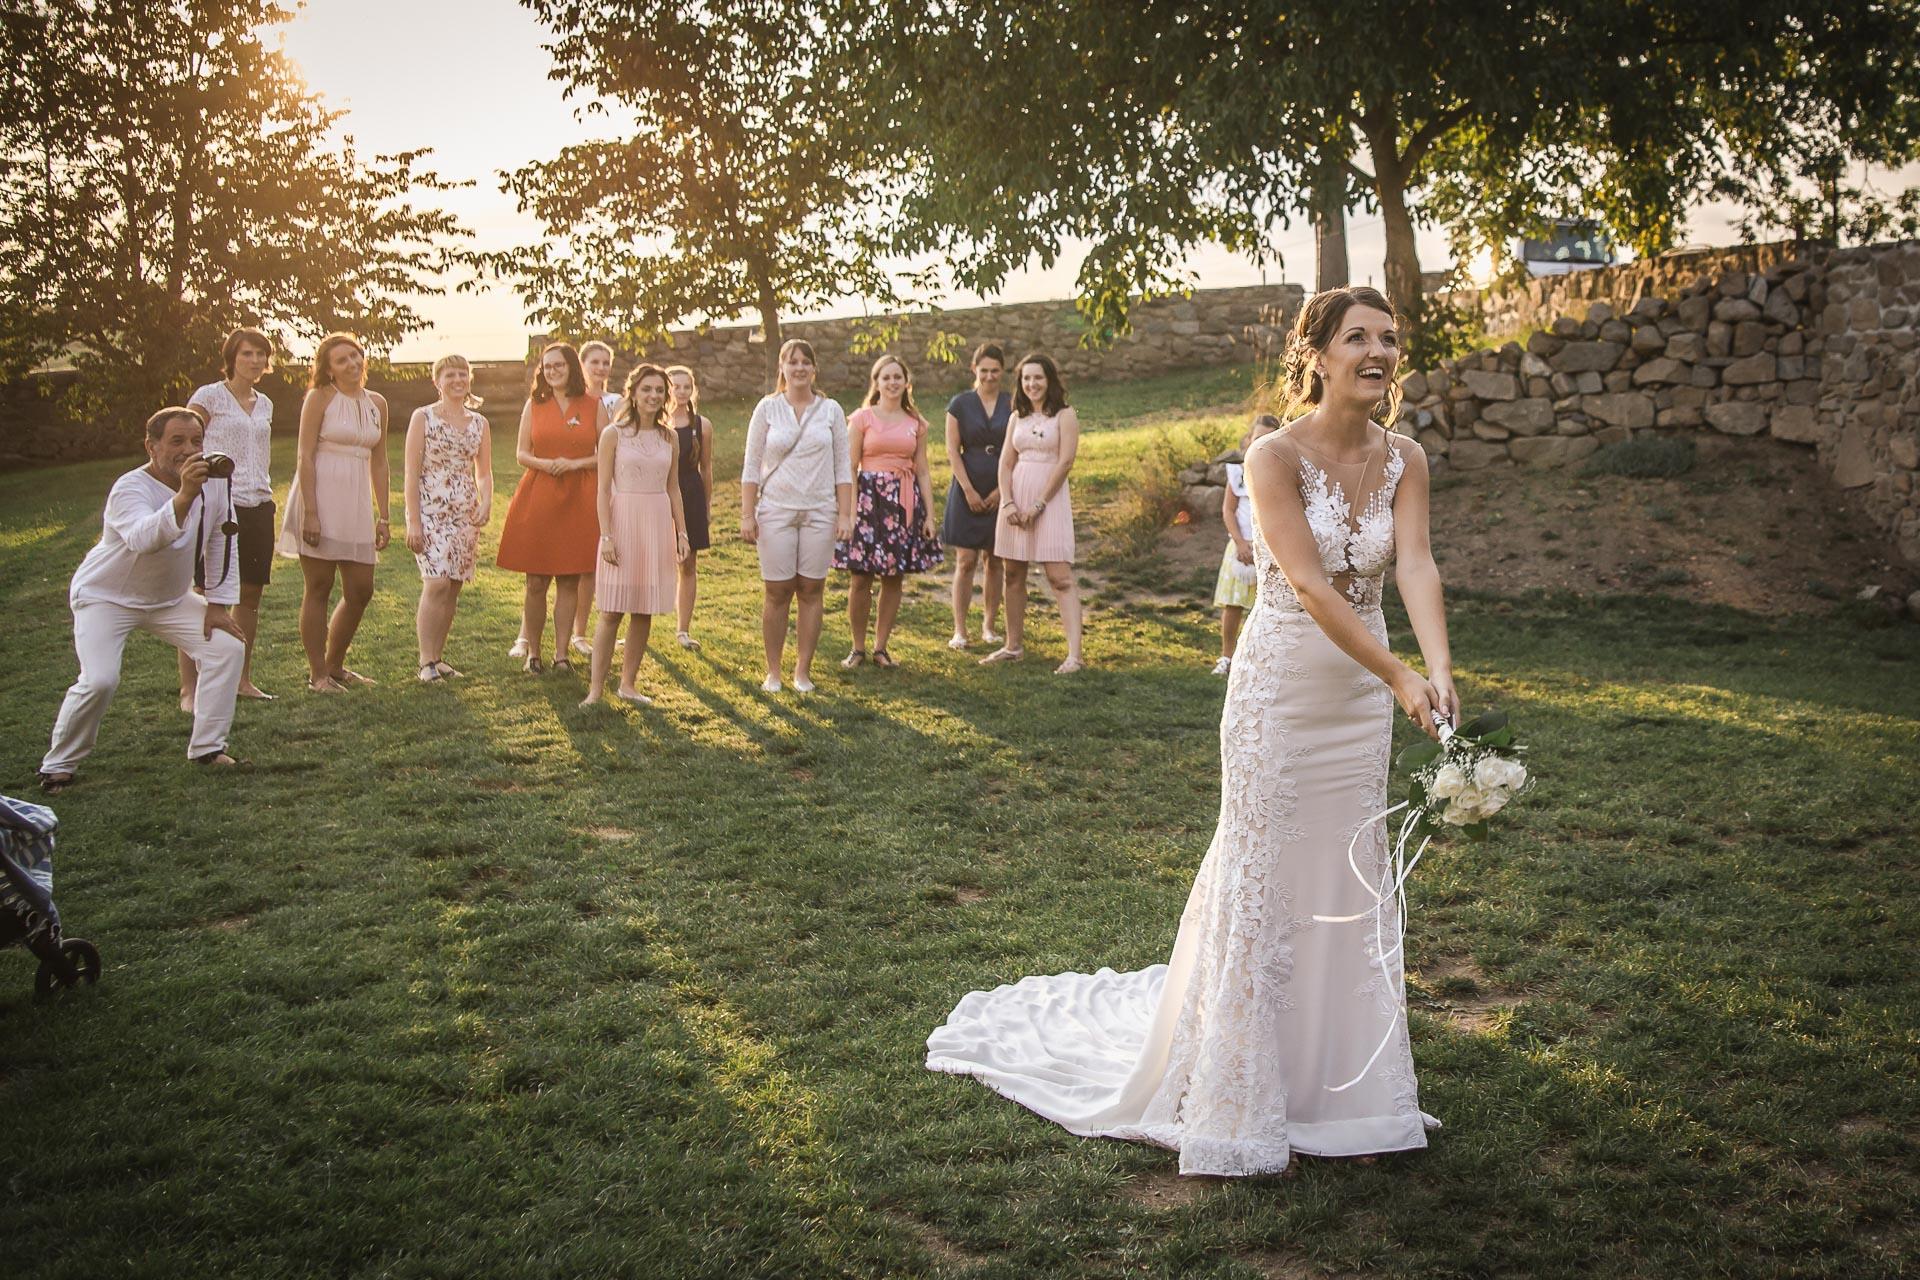 svatební-fotograf-wedding-svatebni-video-orlík-vltava-kostel-statek-stodola-boho-svatba-Beautyfoto-564